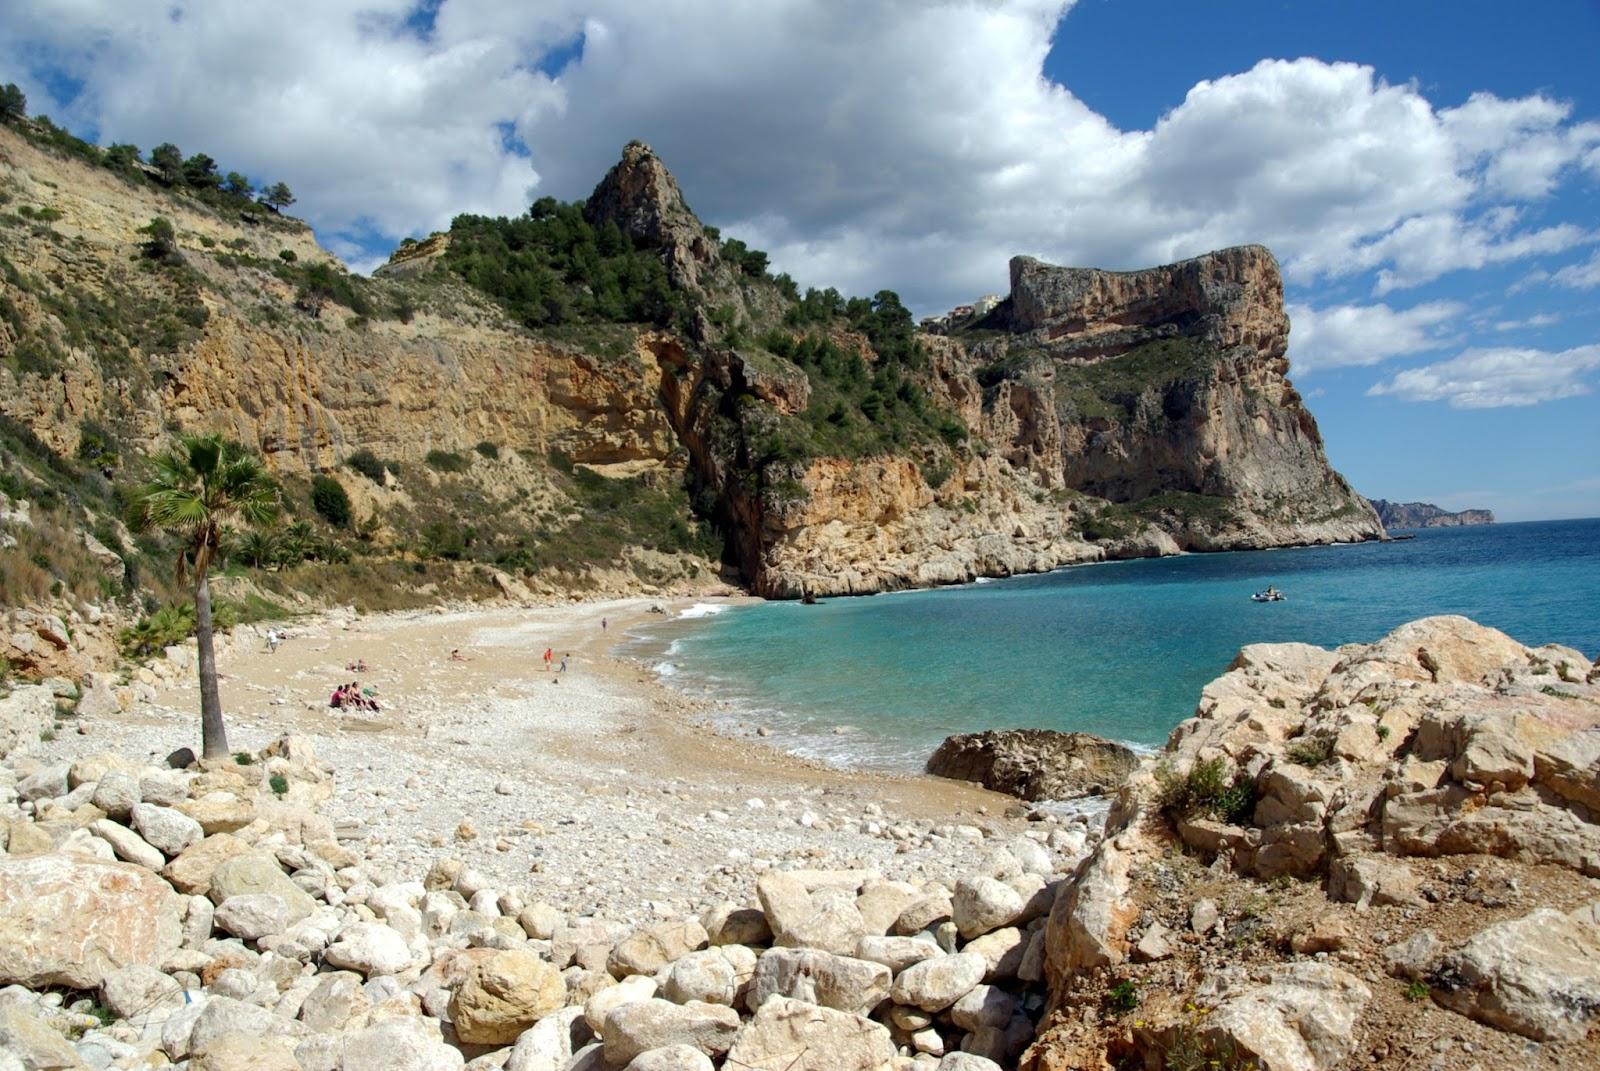 Playa Cala del Saldonar